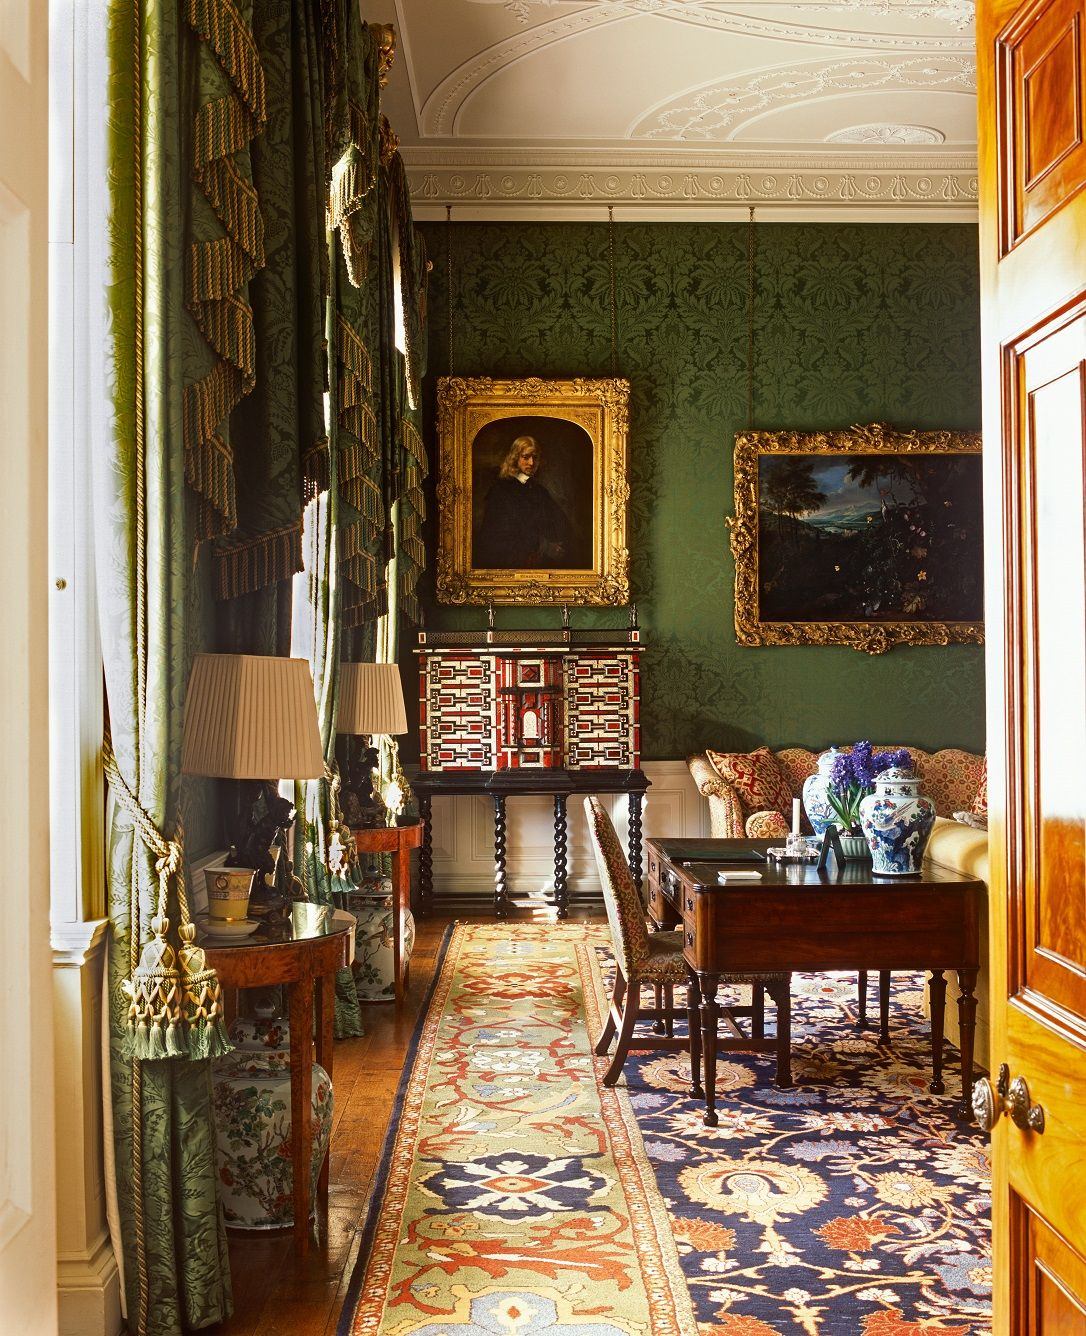 Home Decor, Interior Design Gallery, Country